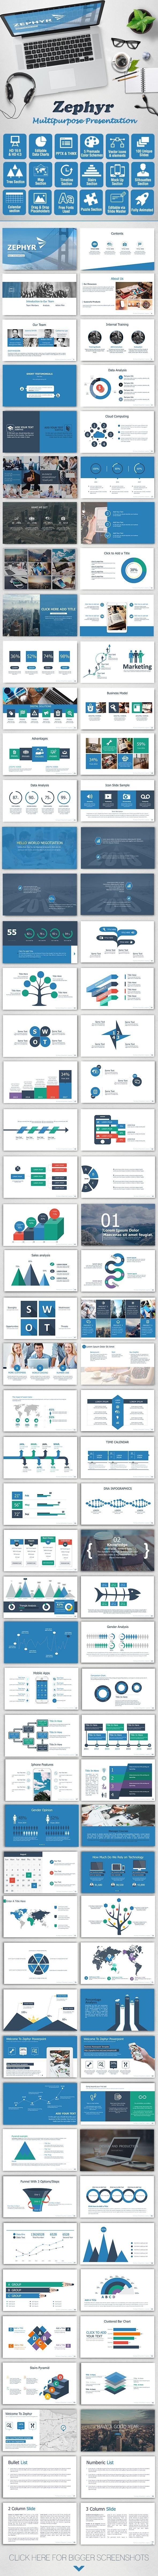 Top tips to create a quality powerpoint presentation   Stump Blog Stumpblog